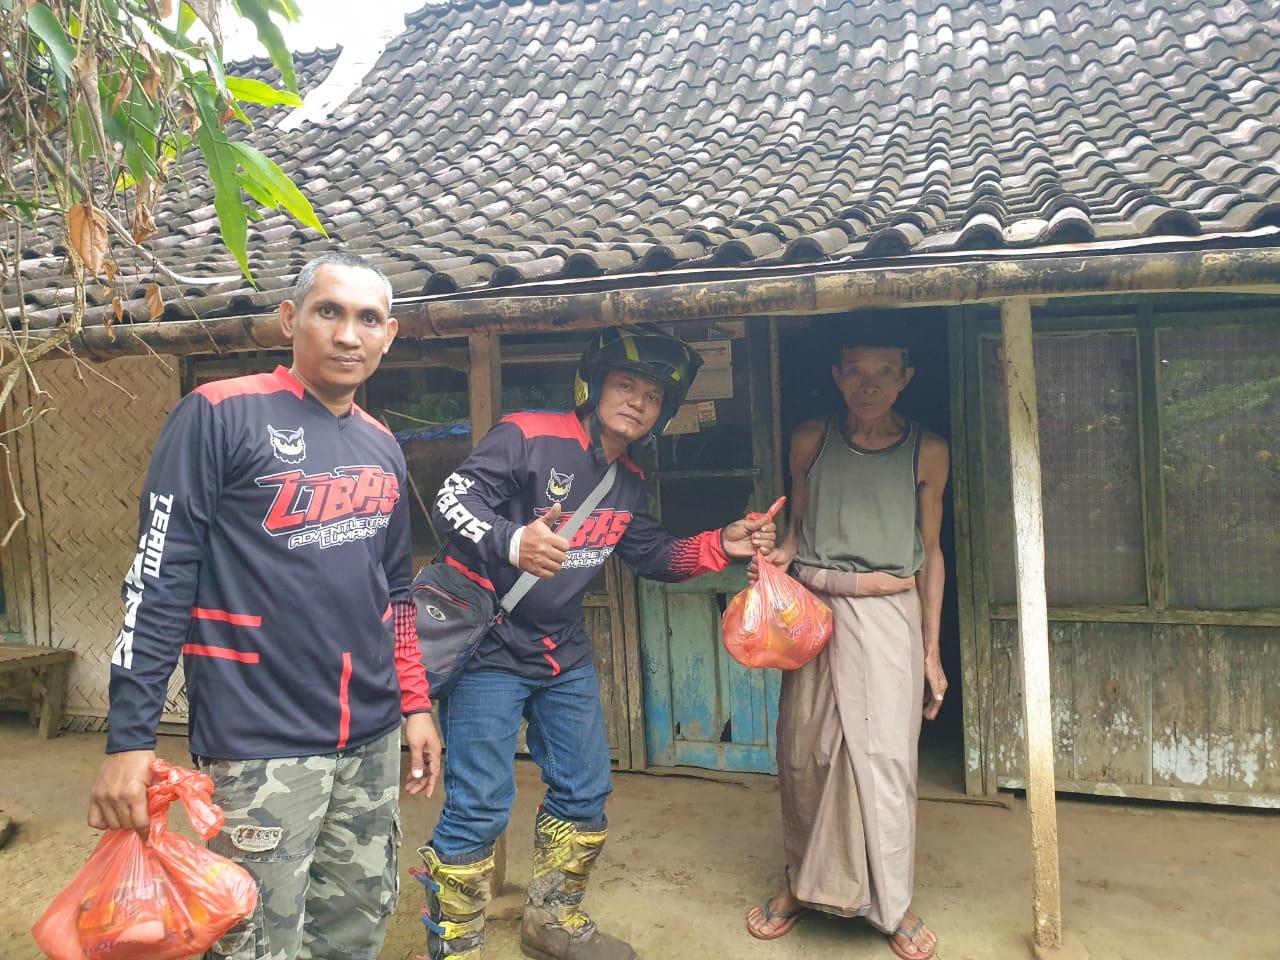 Komunitas Motor Trail LIBAS Lumajang Latber Sambil Bakti Sosial